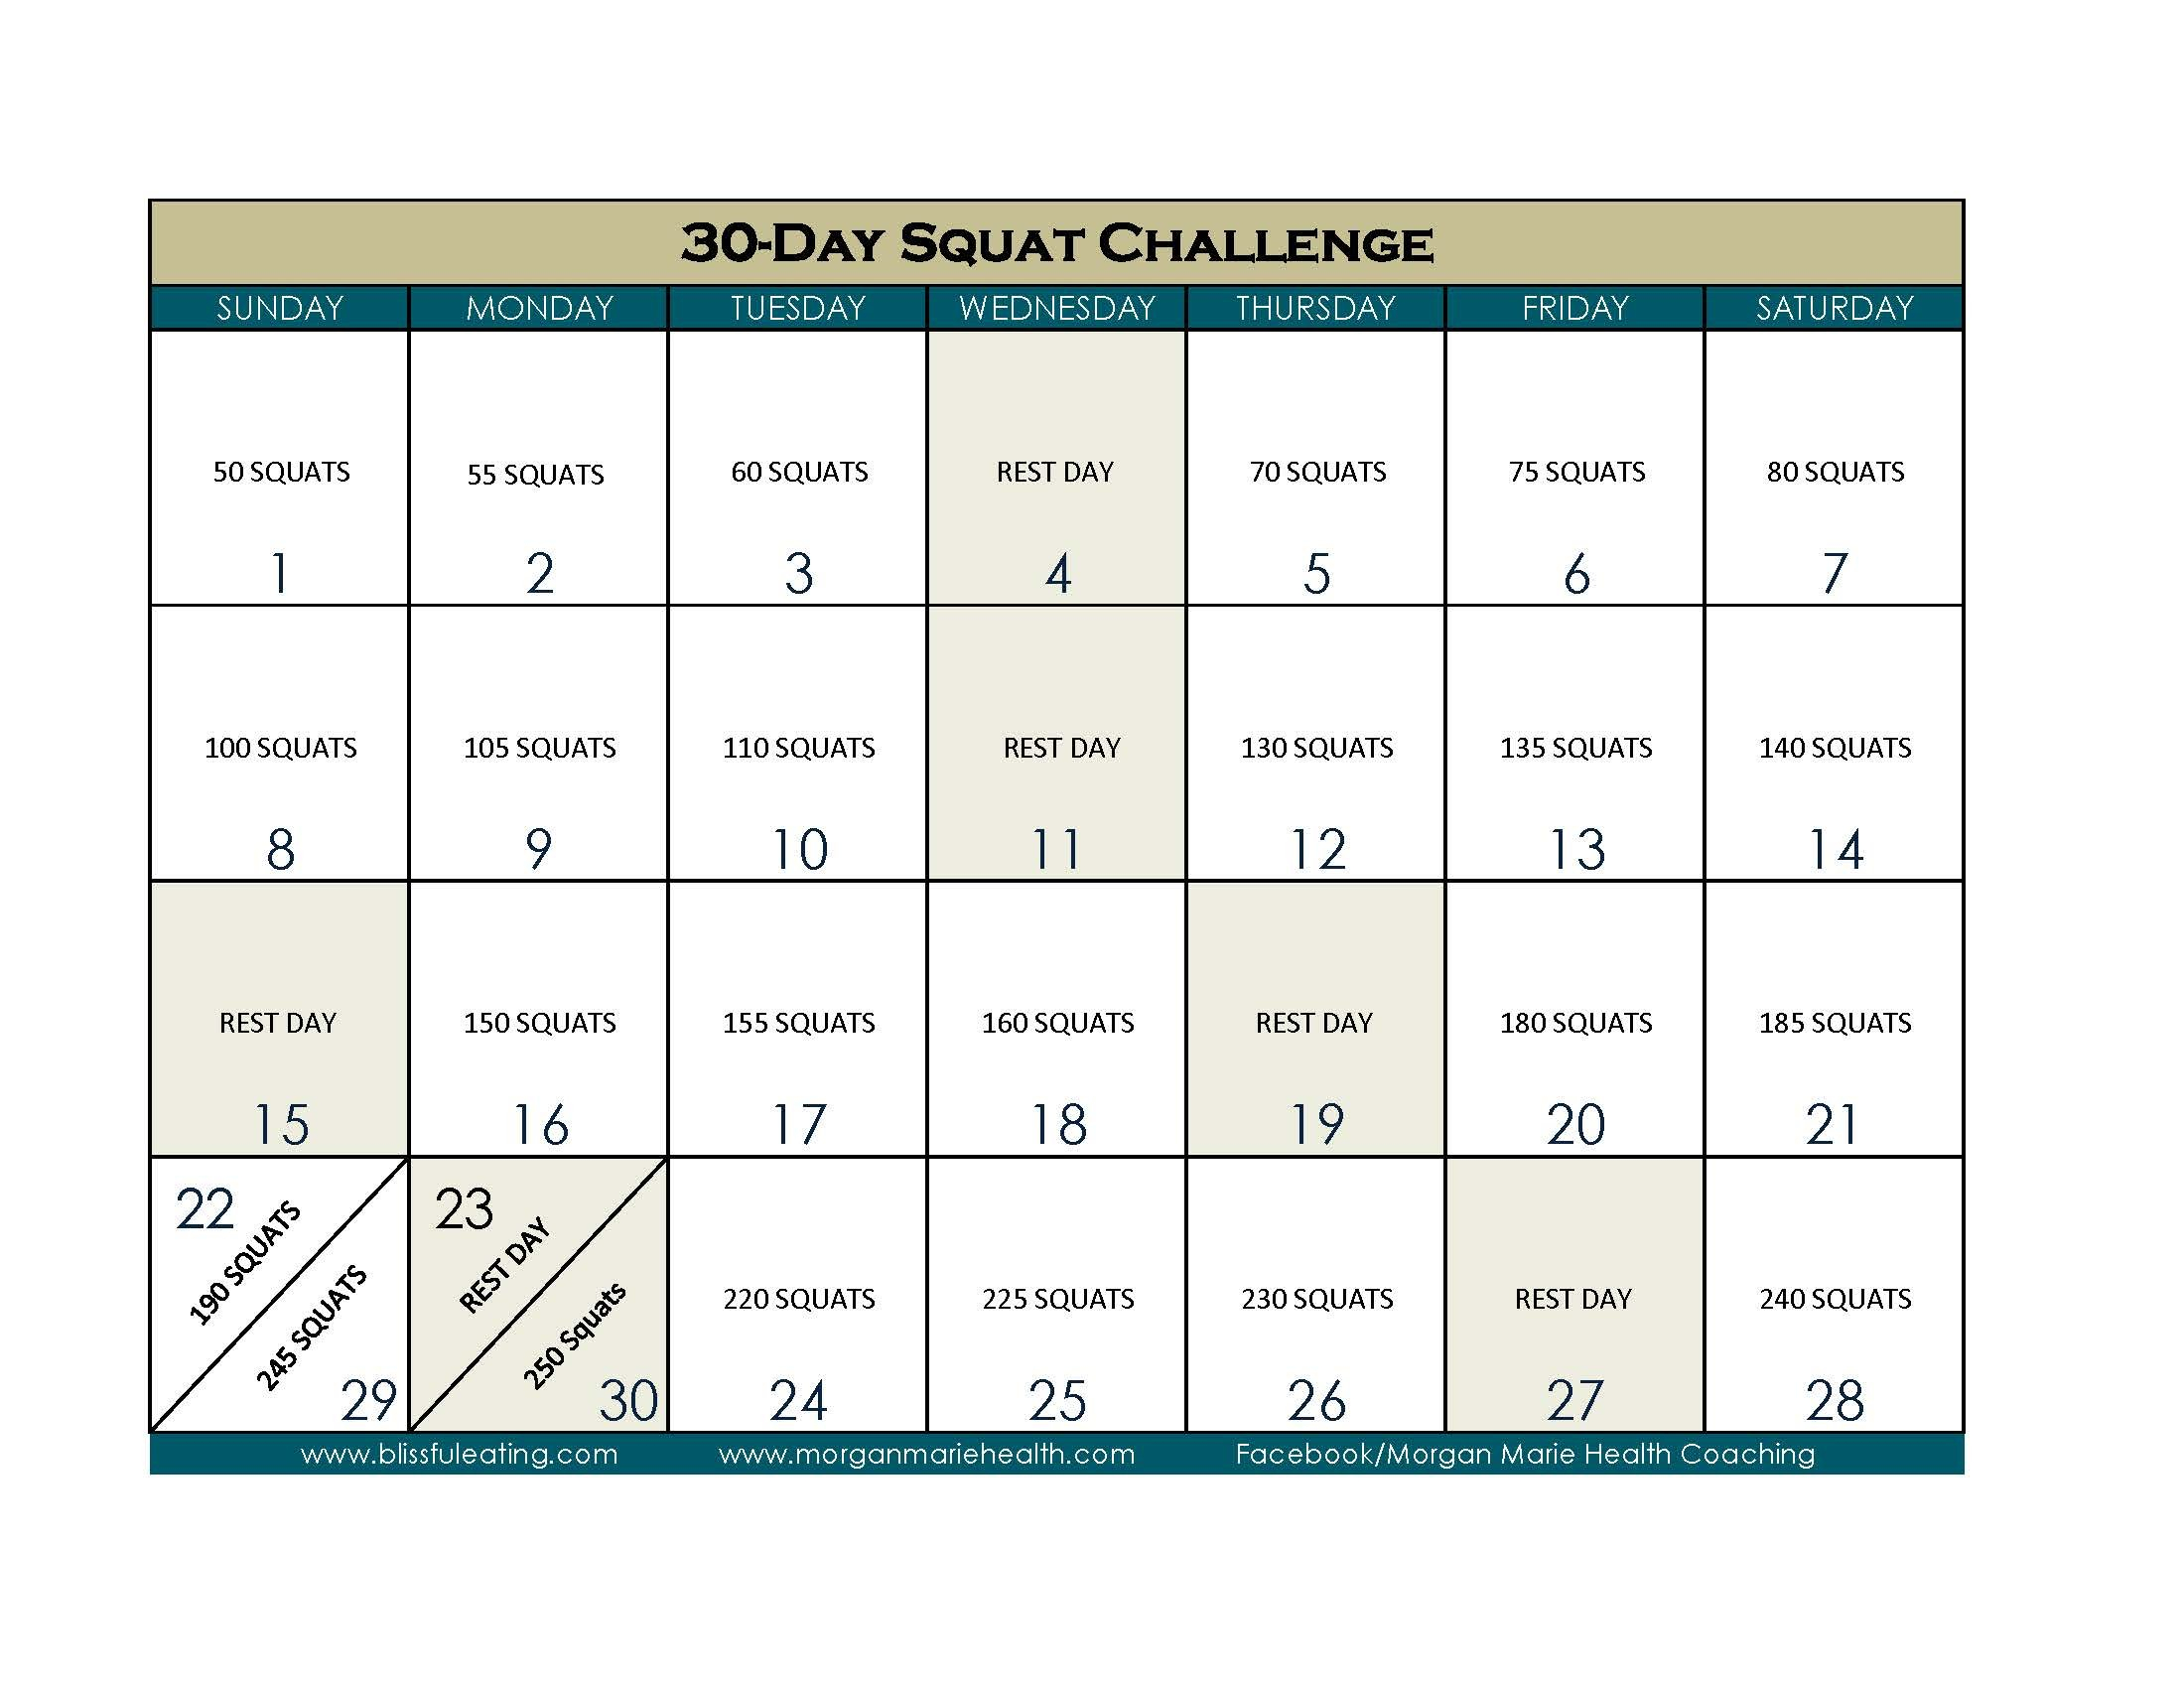 30 Day Squat Calender | Printable Calendar 2020 2021 30 Day Printable Calender